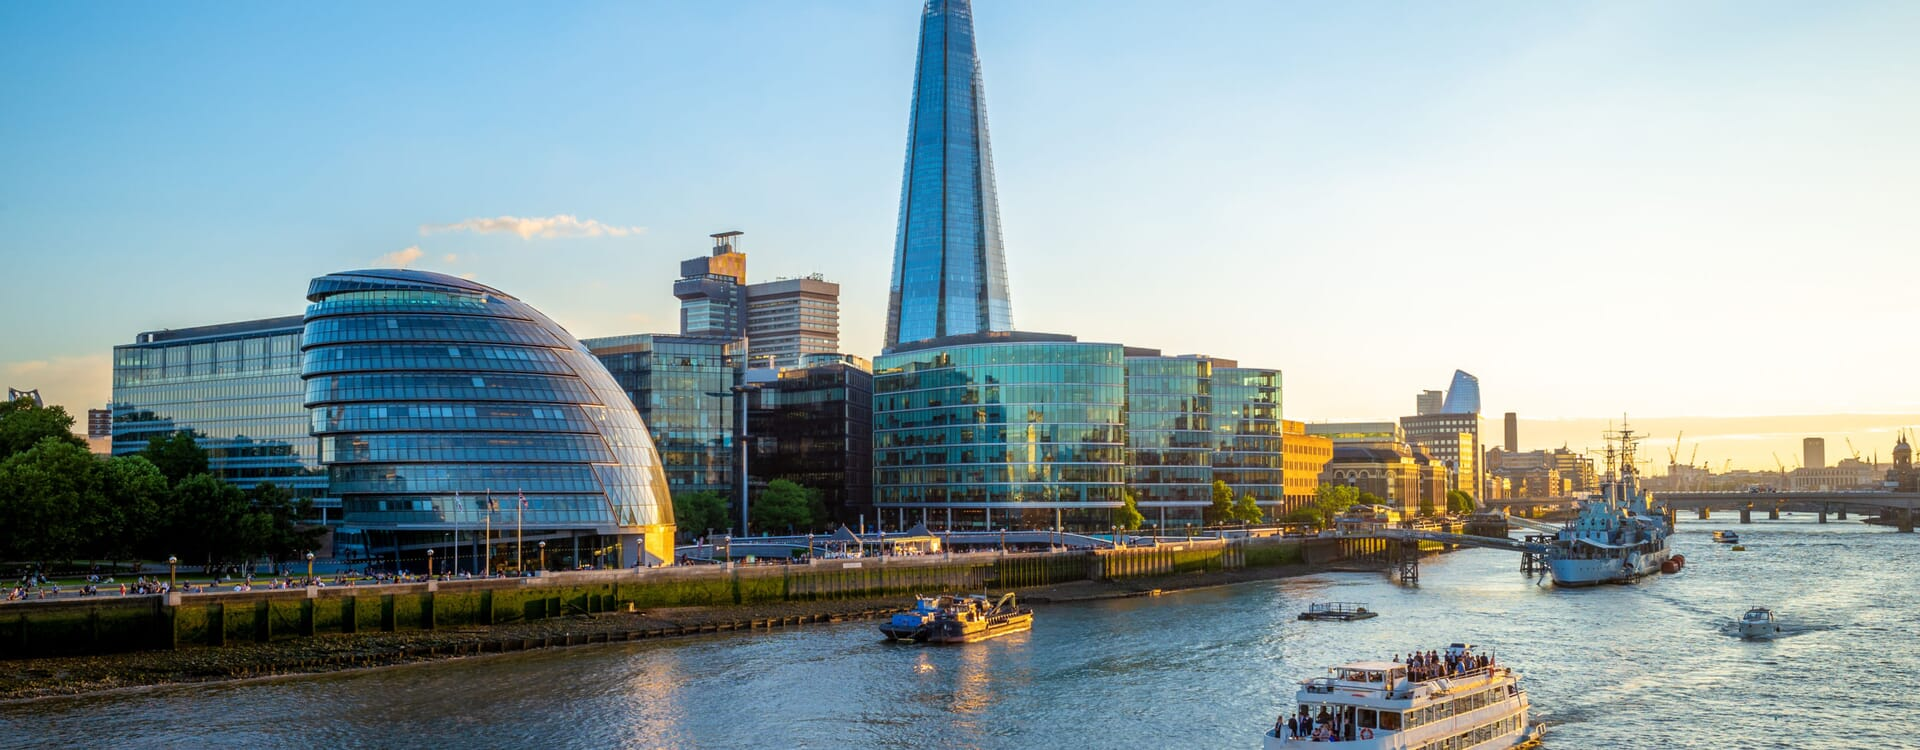 Corporate hospitality London